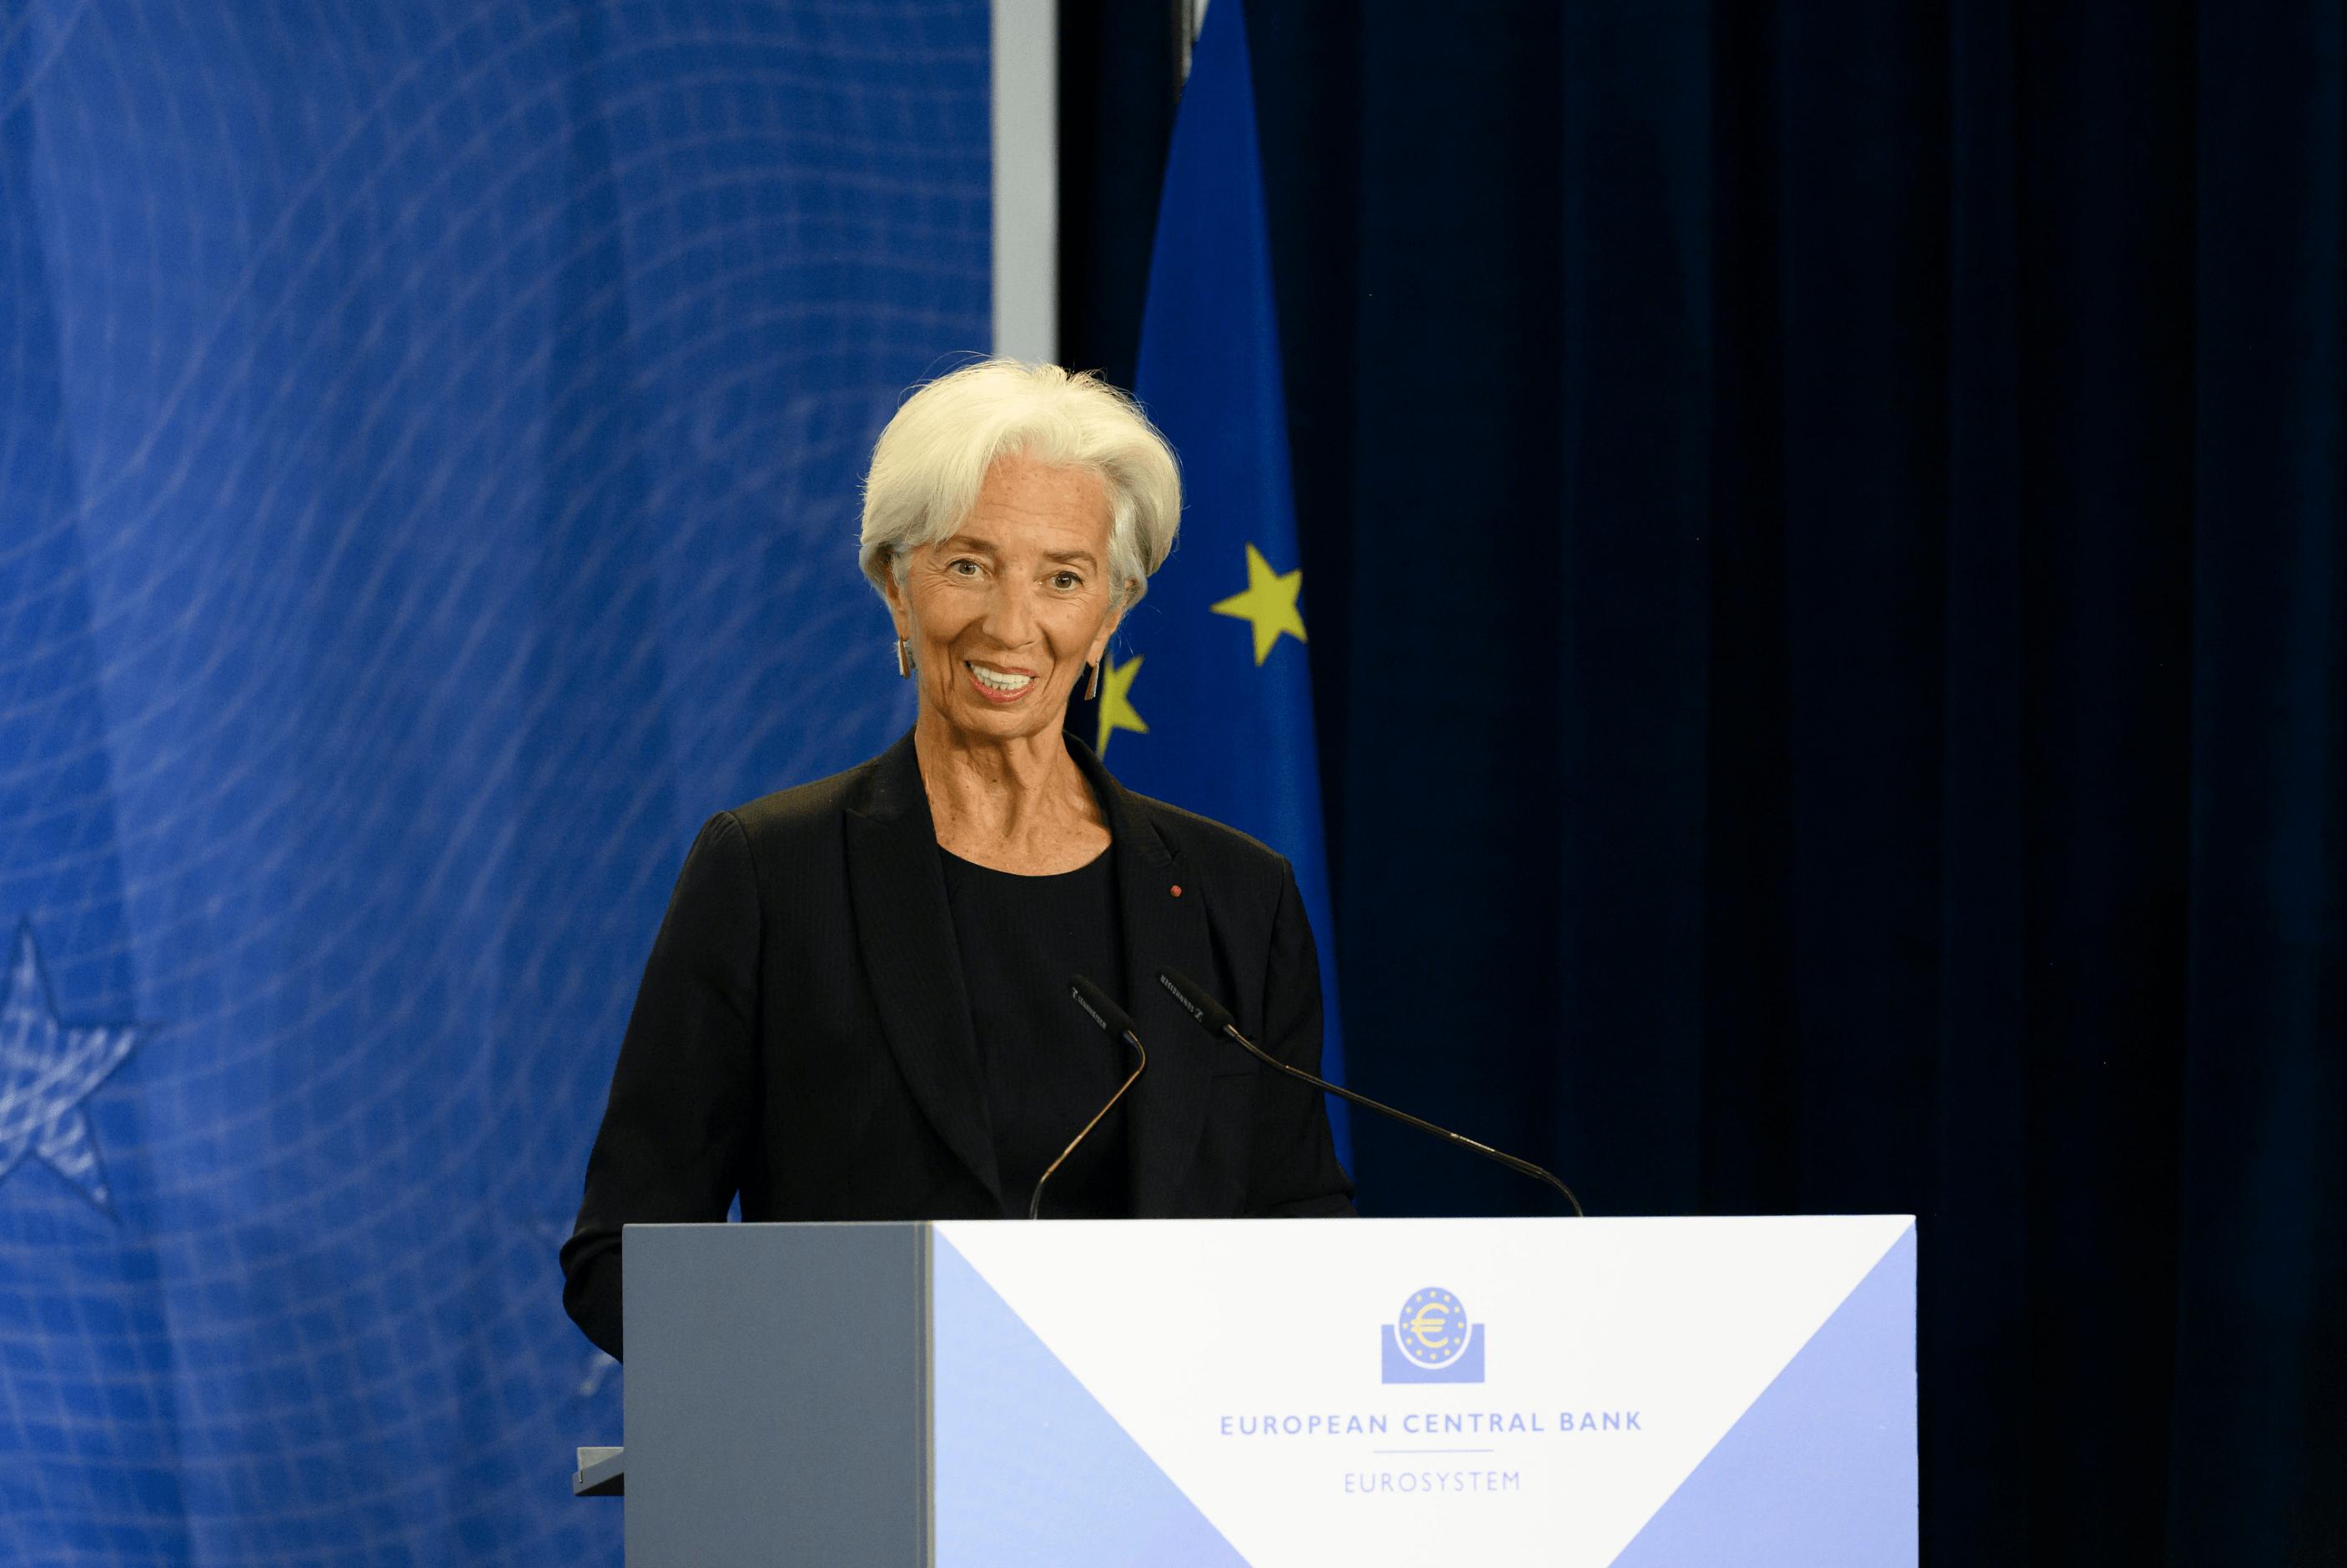 Christine Lagarde ist ab heute als EZB-Chefin tätig